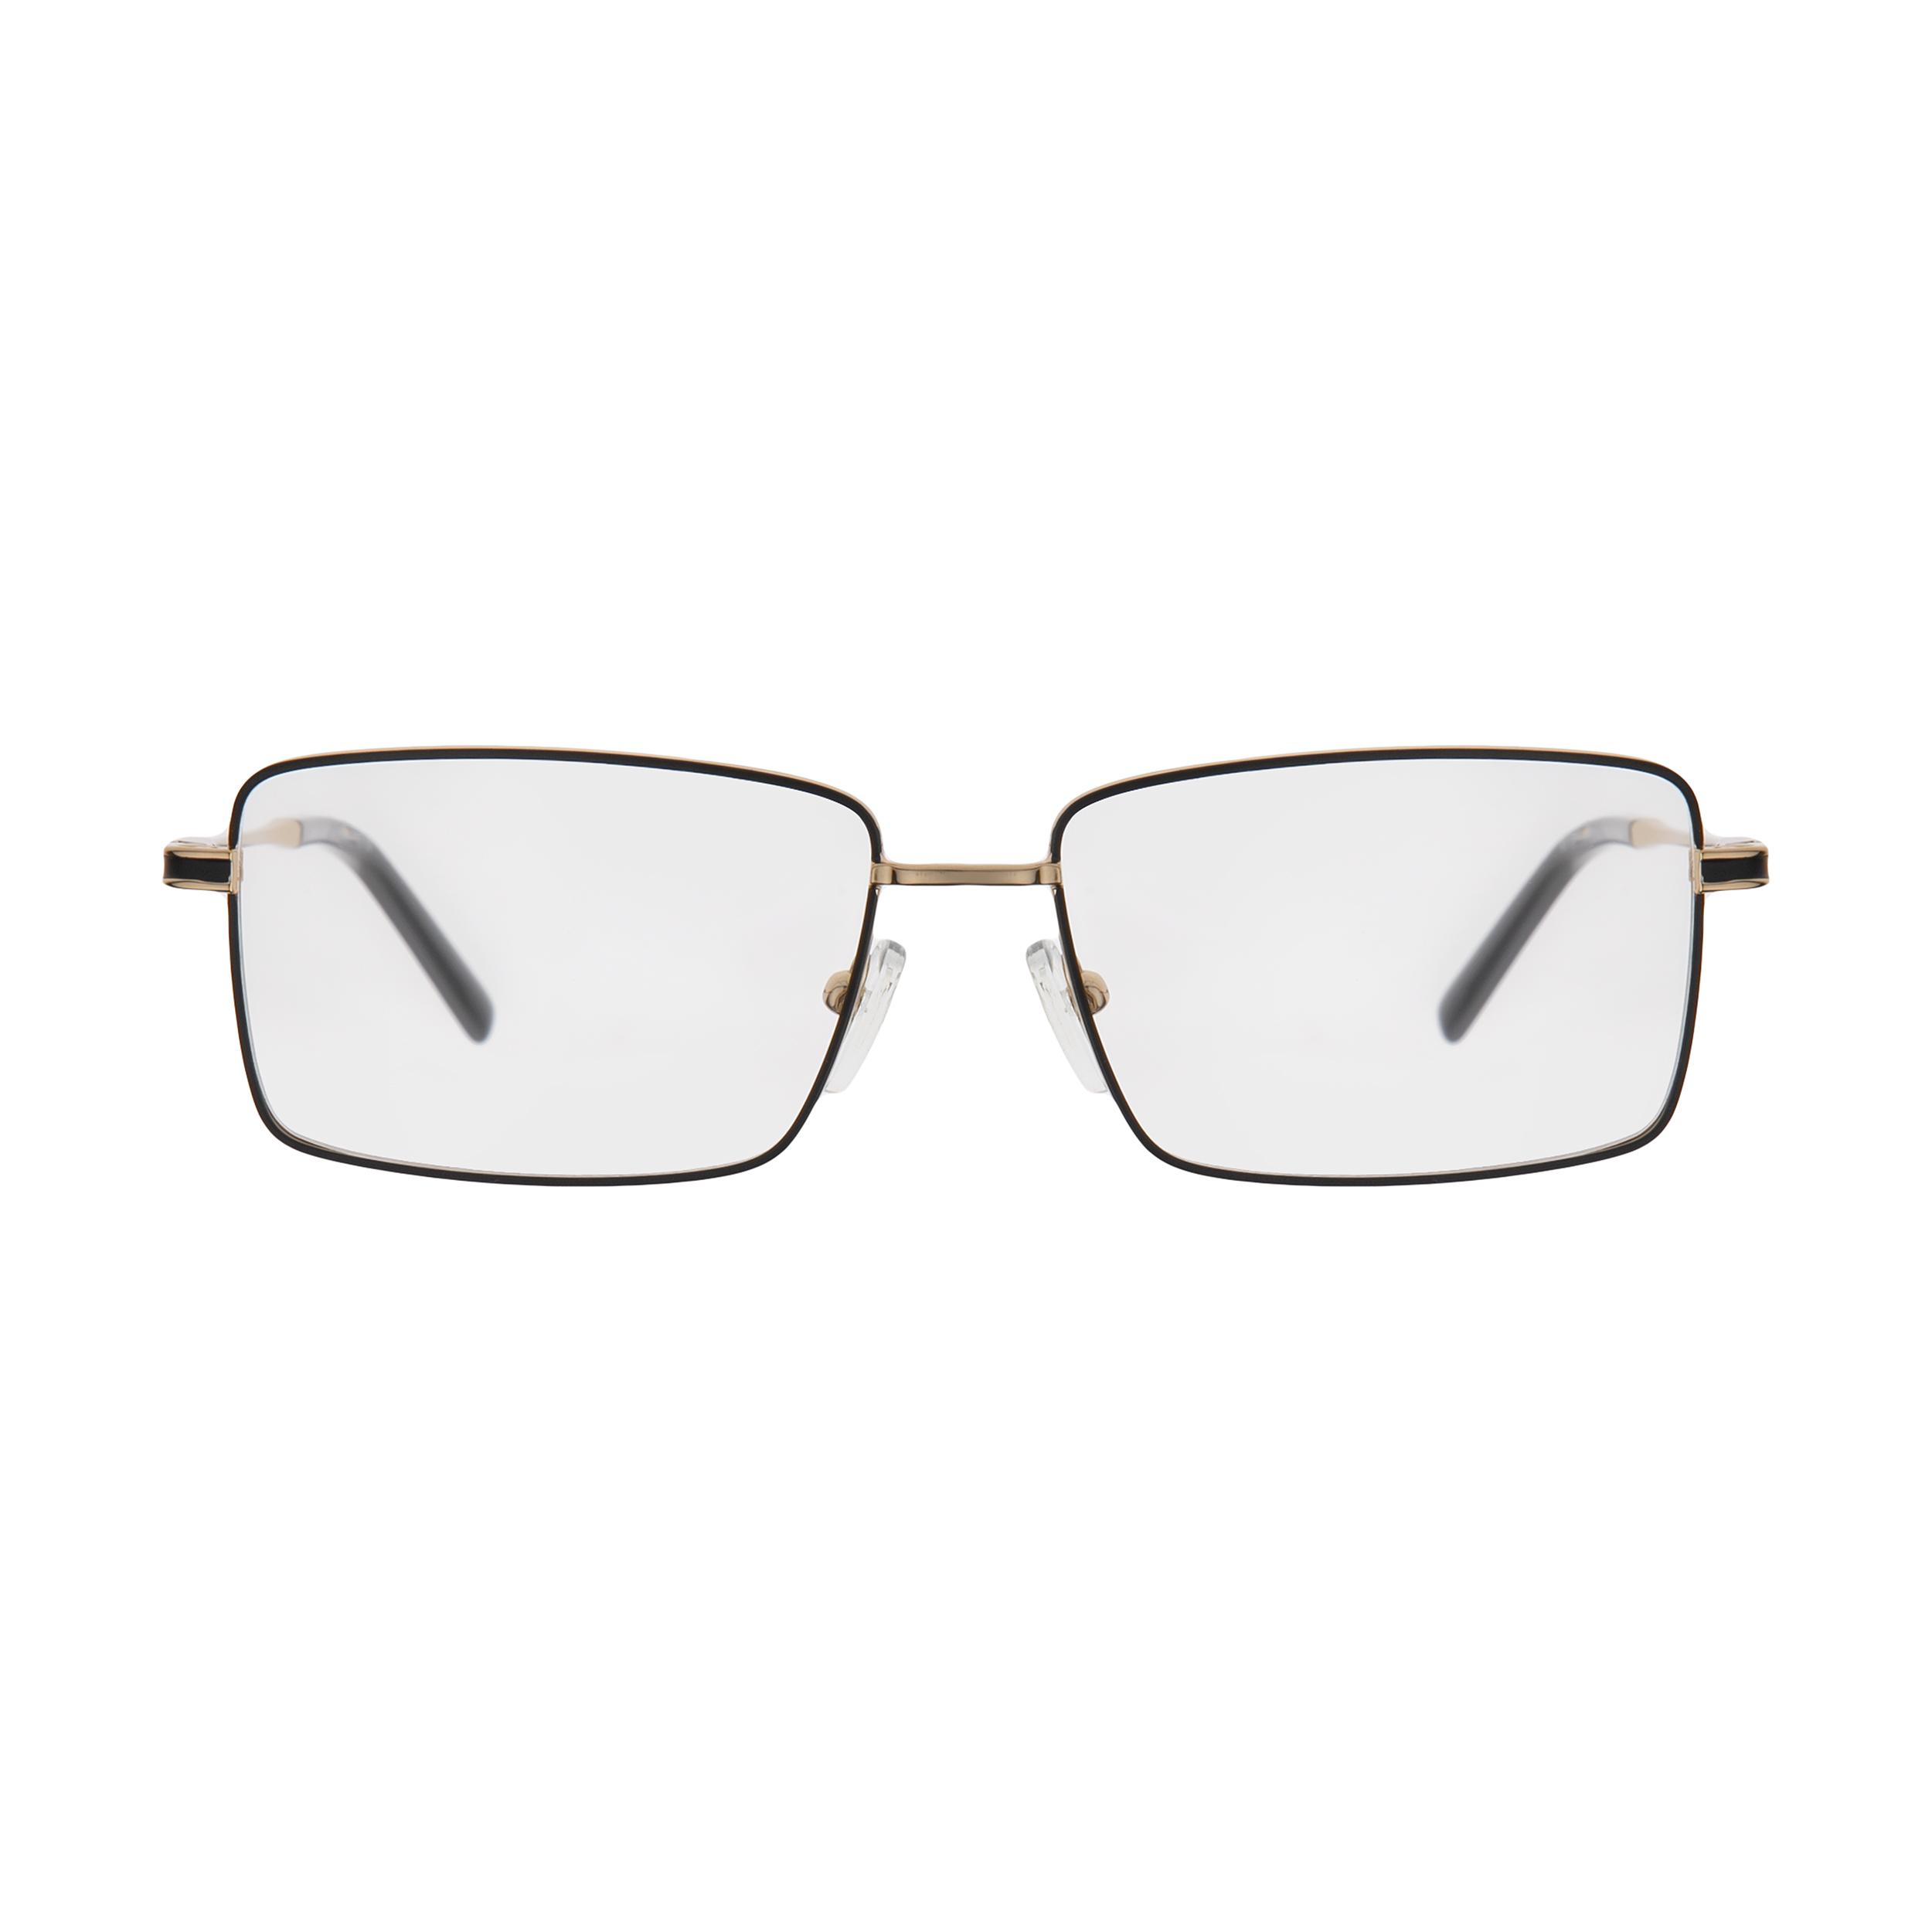 فریم عینک طبی مون بلان مدل 6934